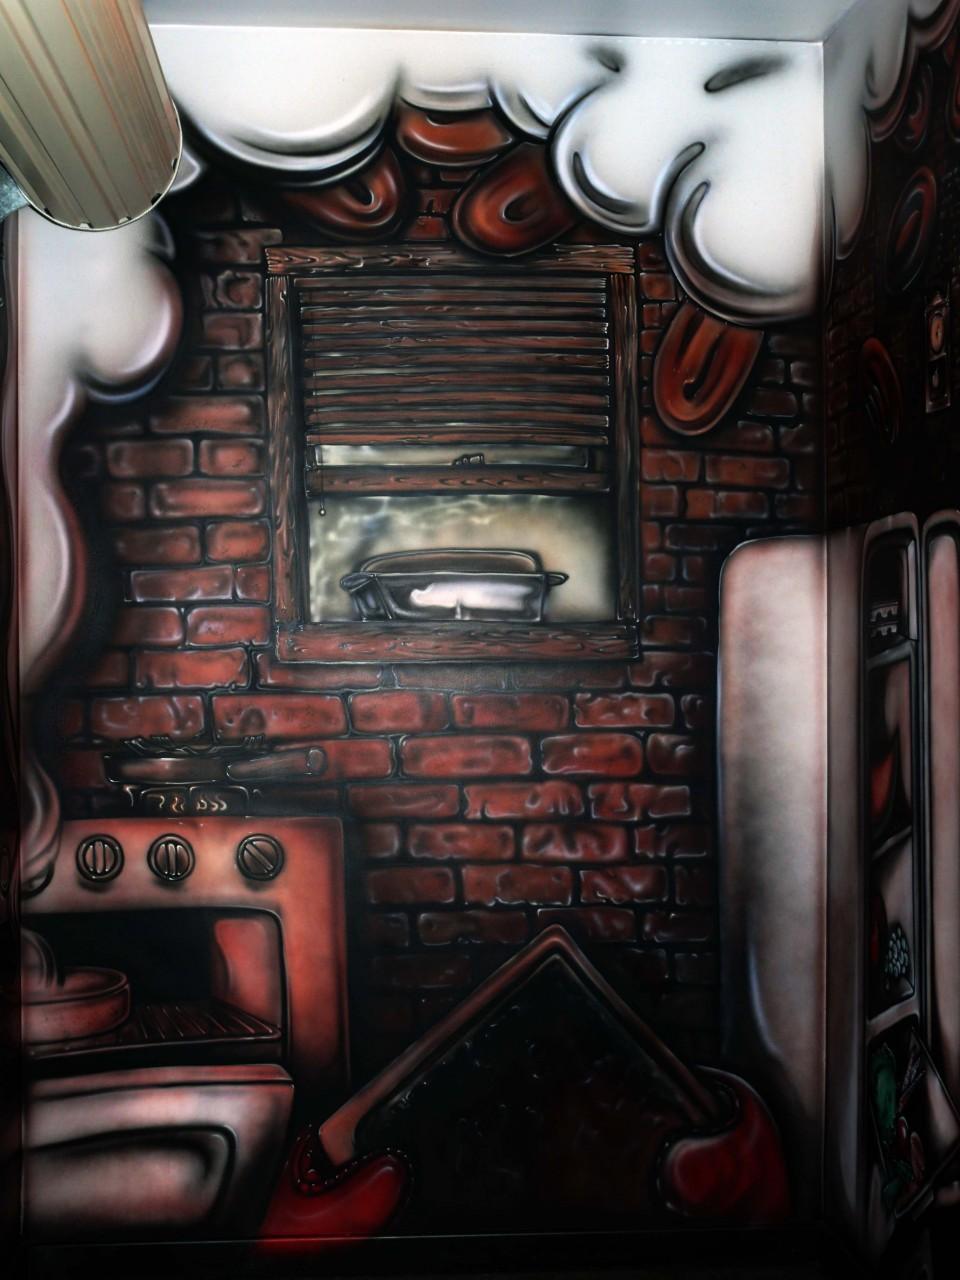 airbrush art-airbrush art perth-airbrush perth-airbrush murals-airbrush signs-signs-airbrush graphics-Kaldi Cafe10